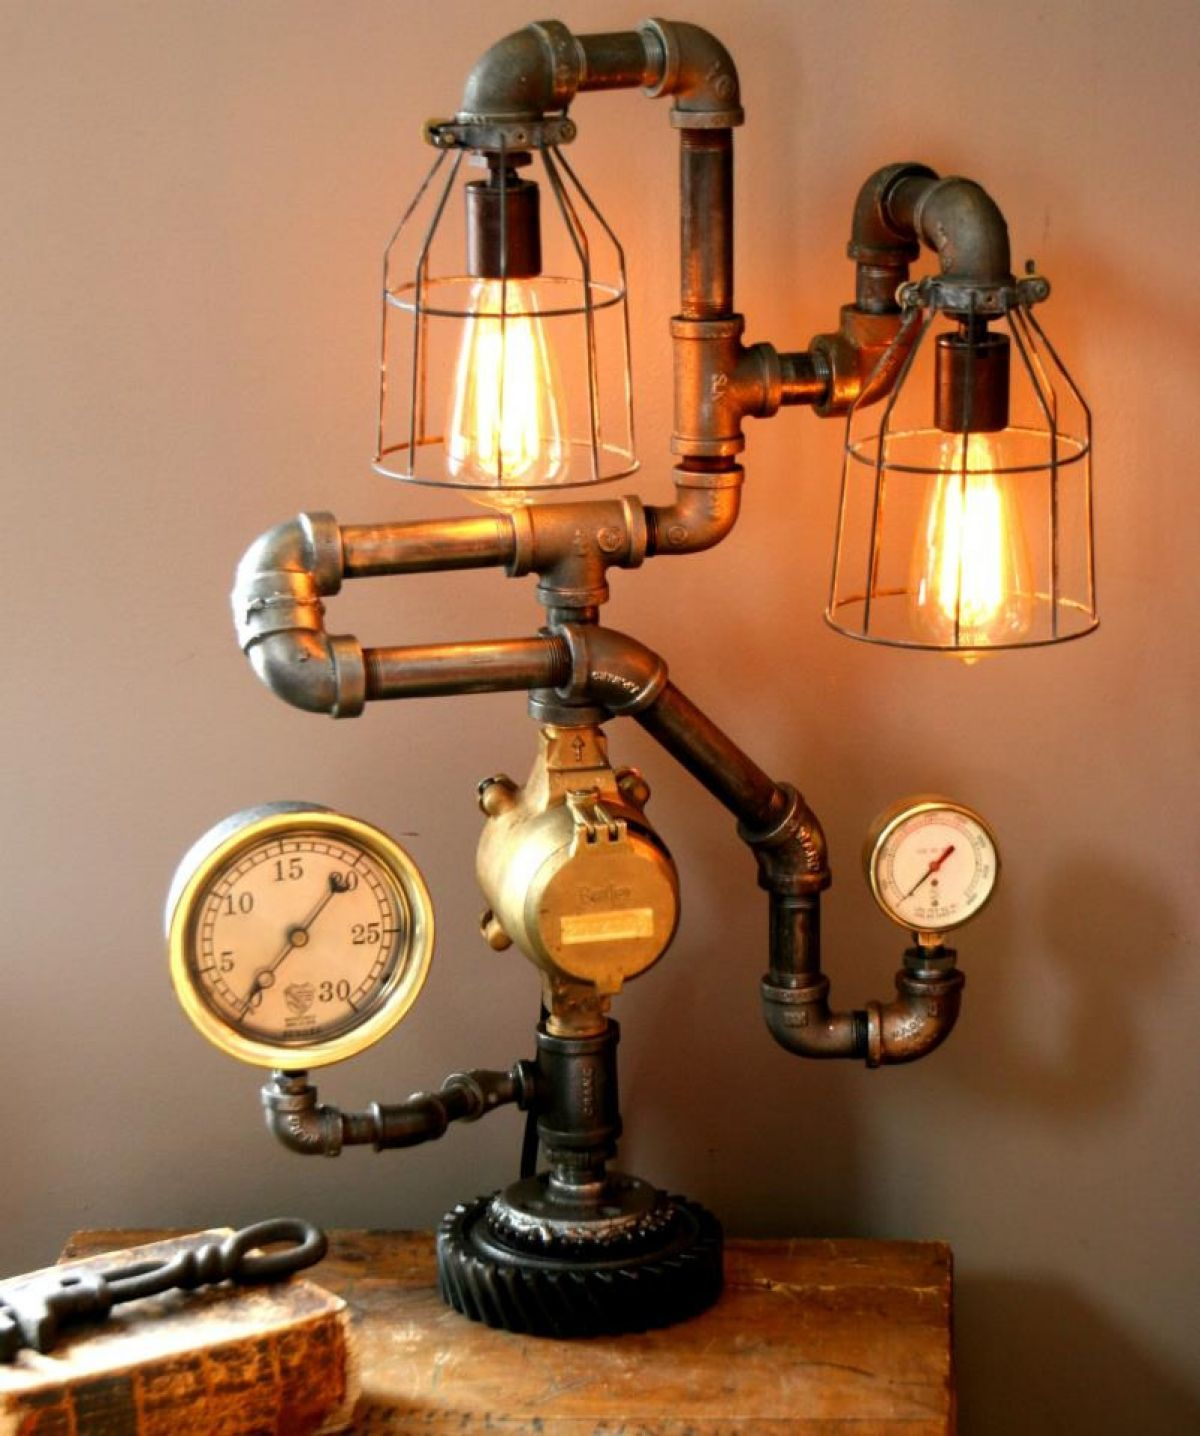 20_Machine-Age-Lamps_4-f.jpg (1200×1436)